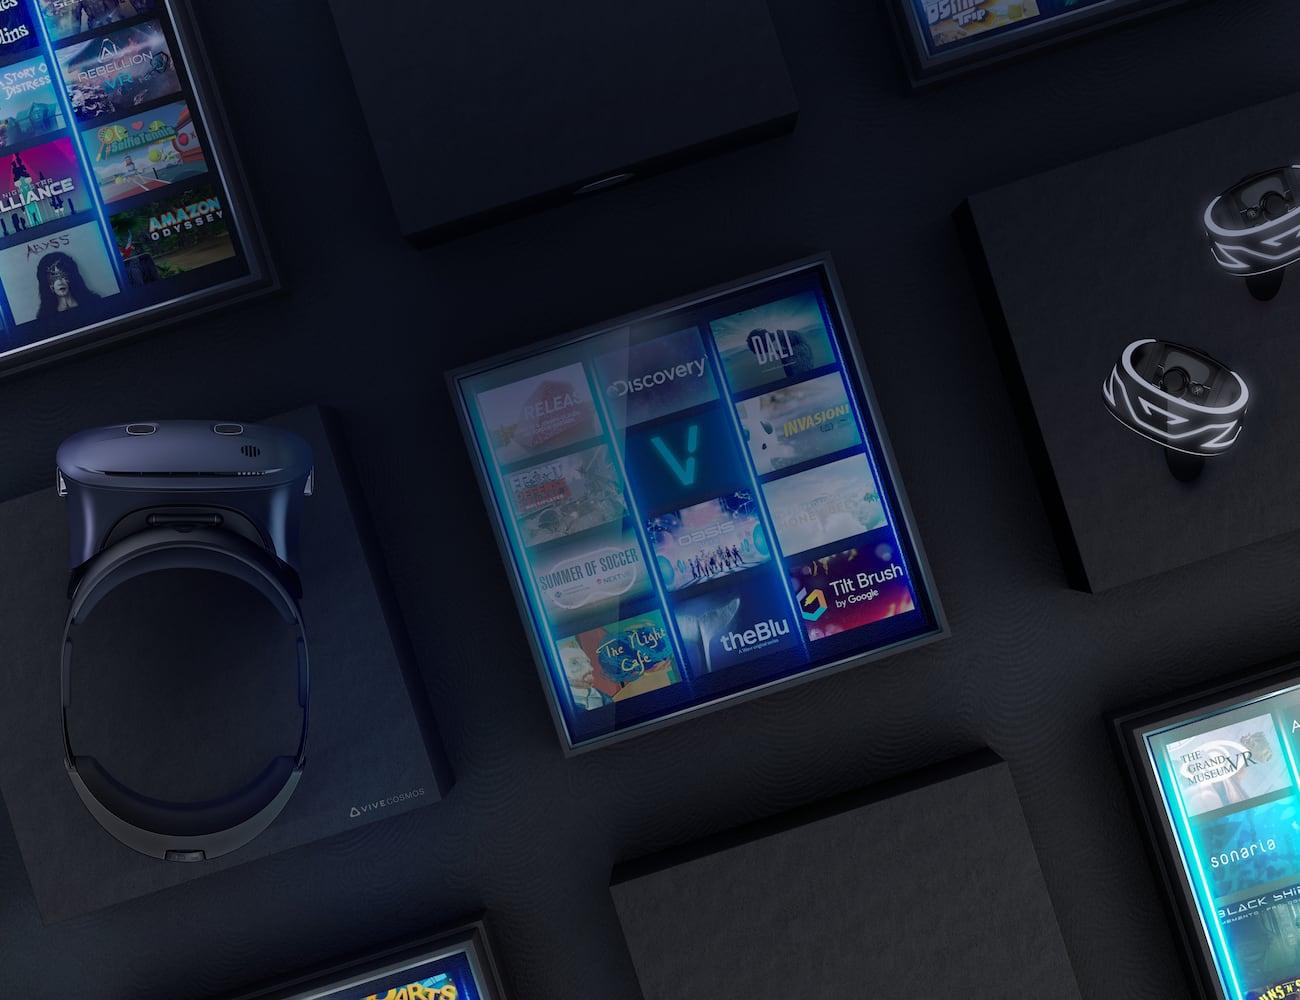 HTC VIVE Cosmos Premium PC VR System